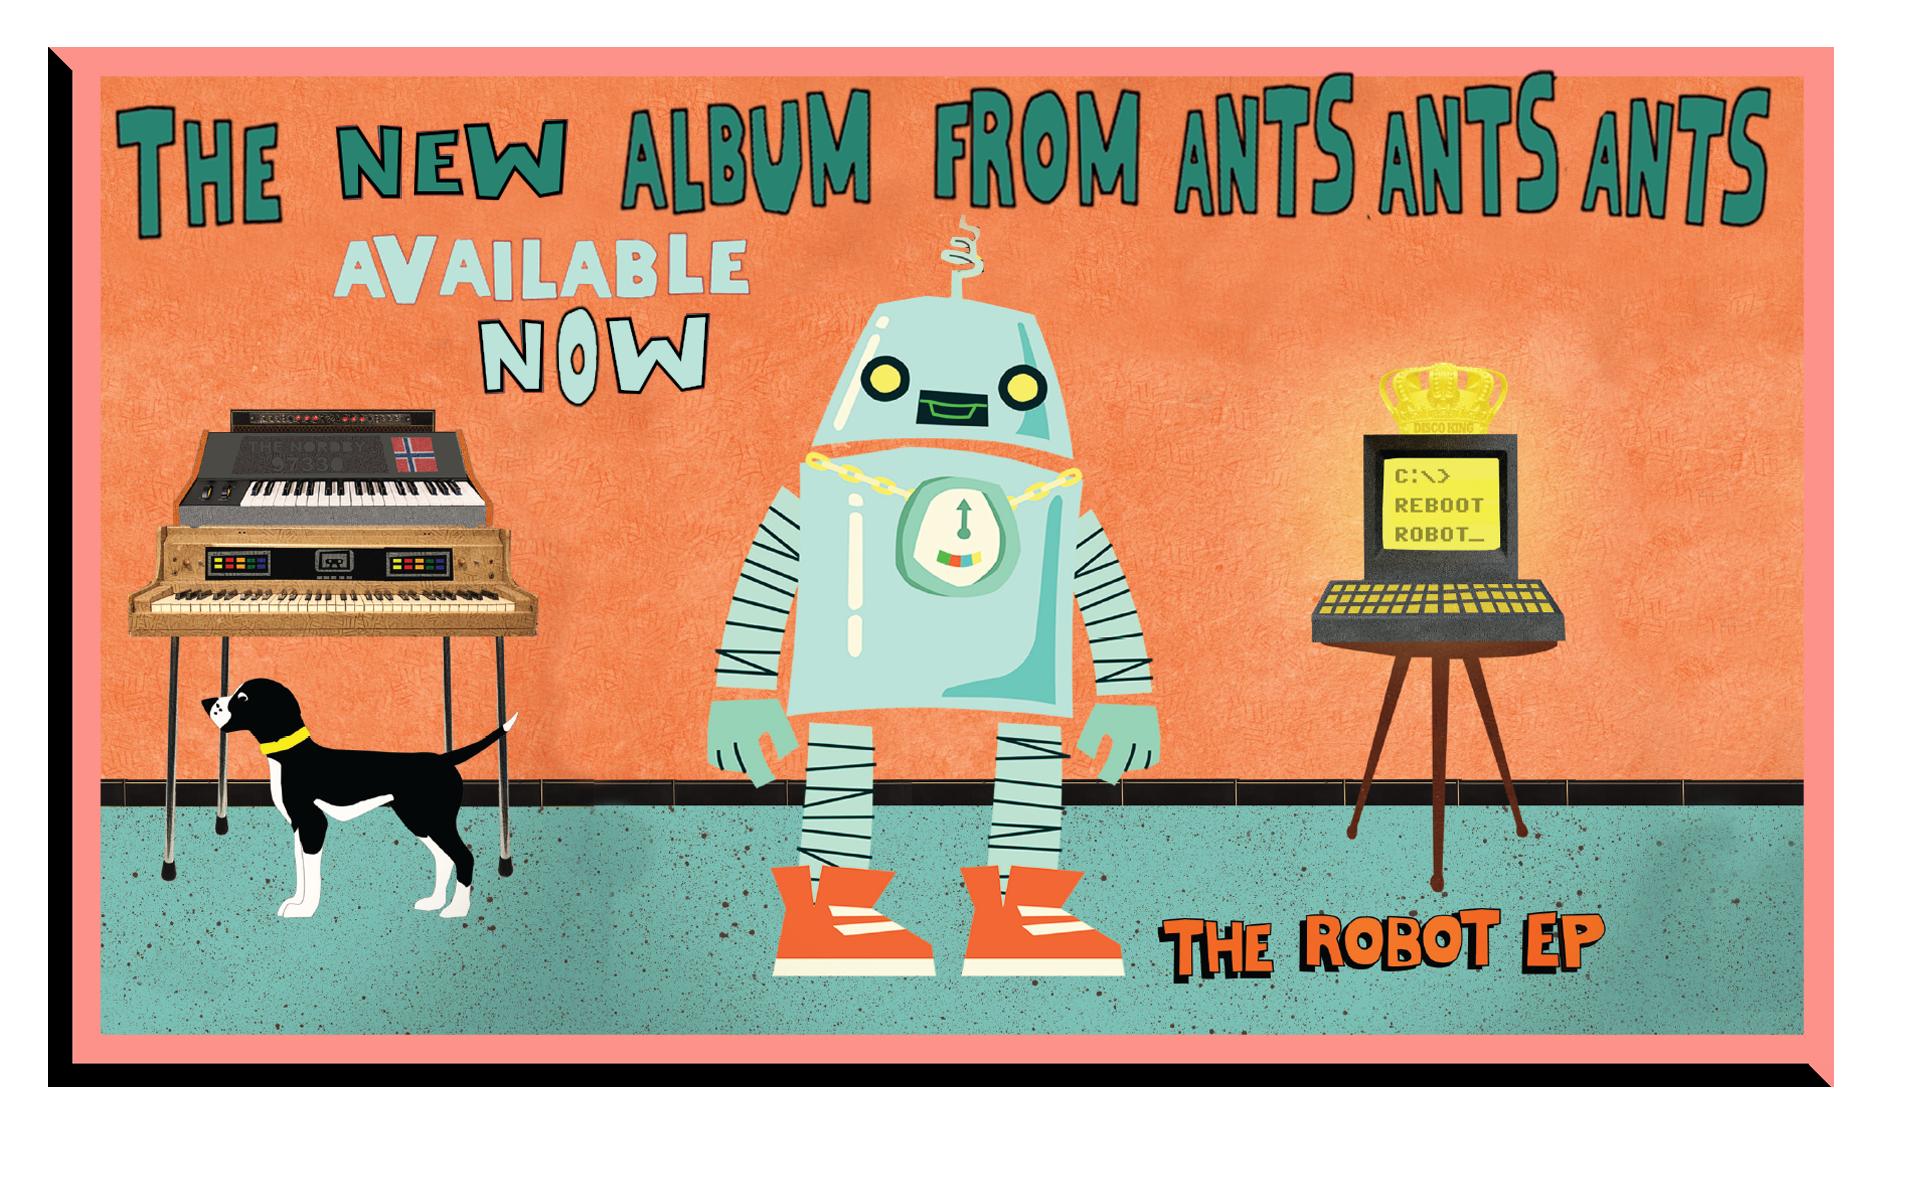 ROBOT_EP_ALBUM_now.png